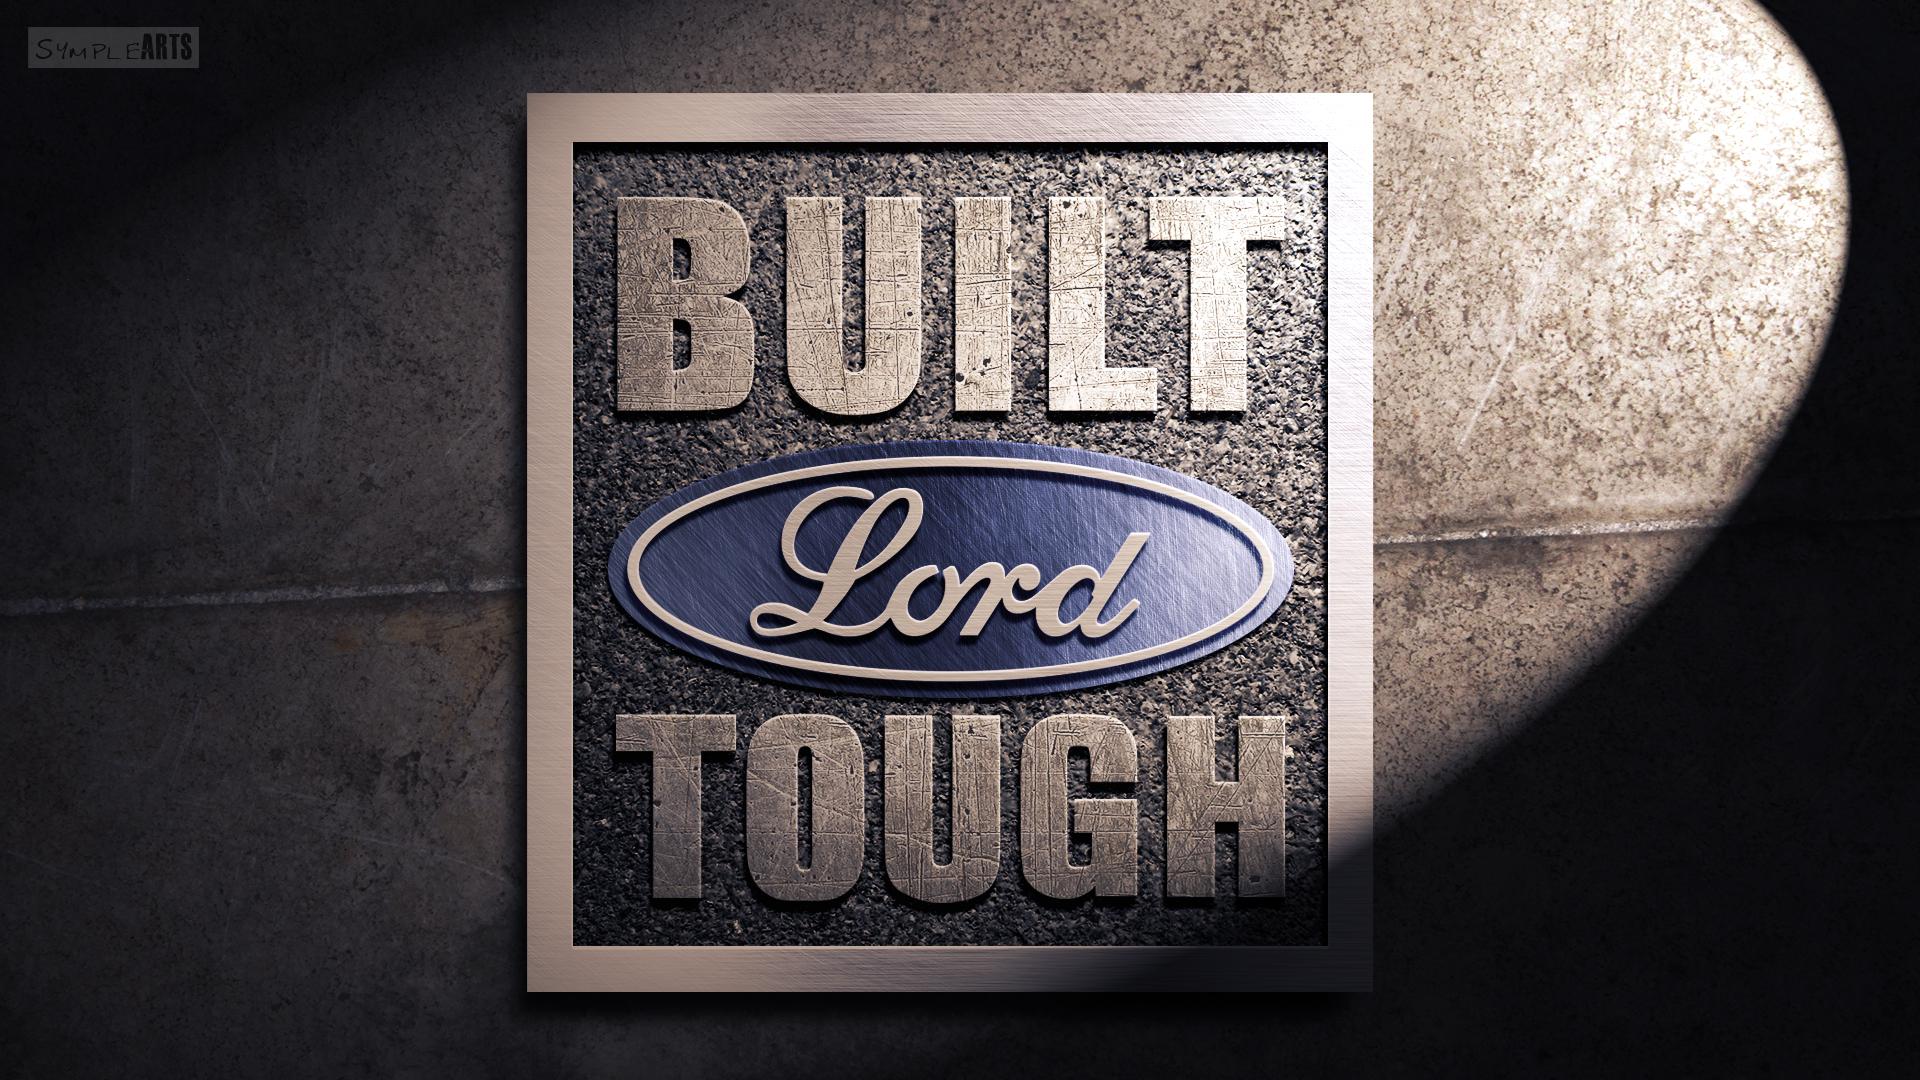 Built Ford Tough Logo Vector   image 586 1920x1080